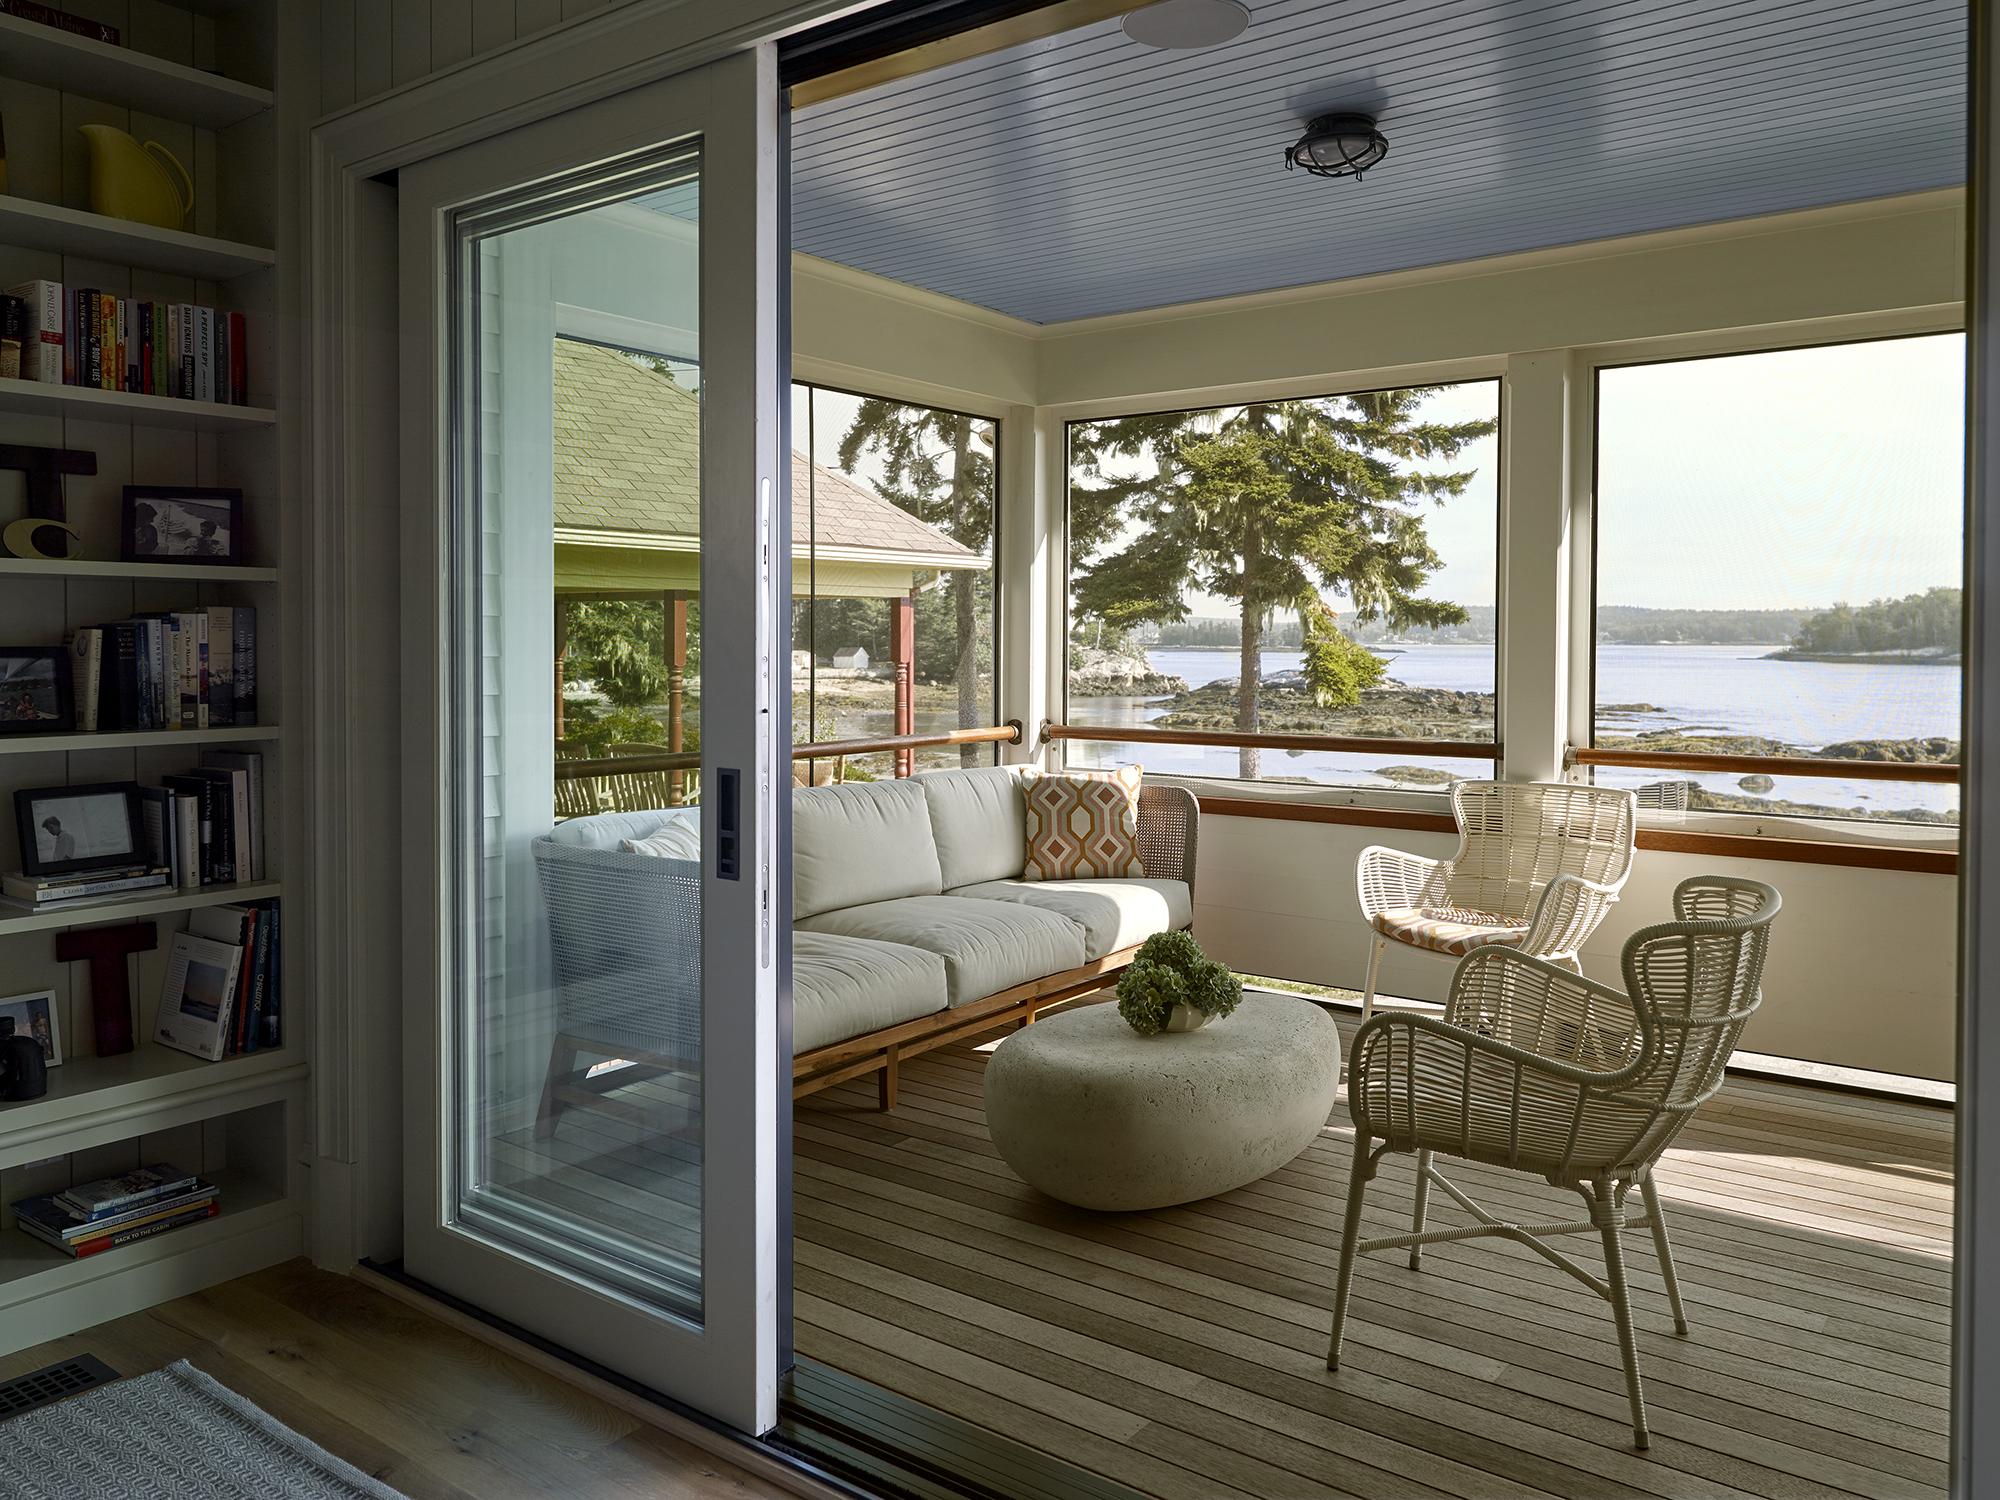 knickerbocker-group-project-capitol-island-cottage-family-coastal-living